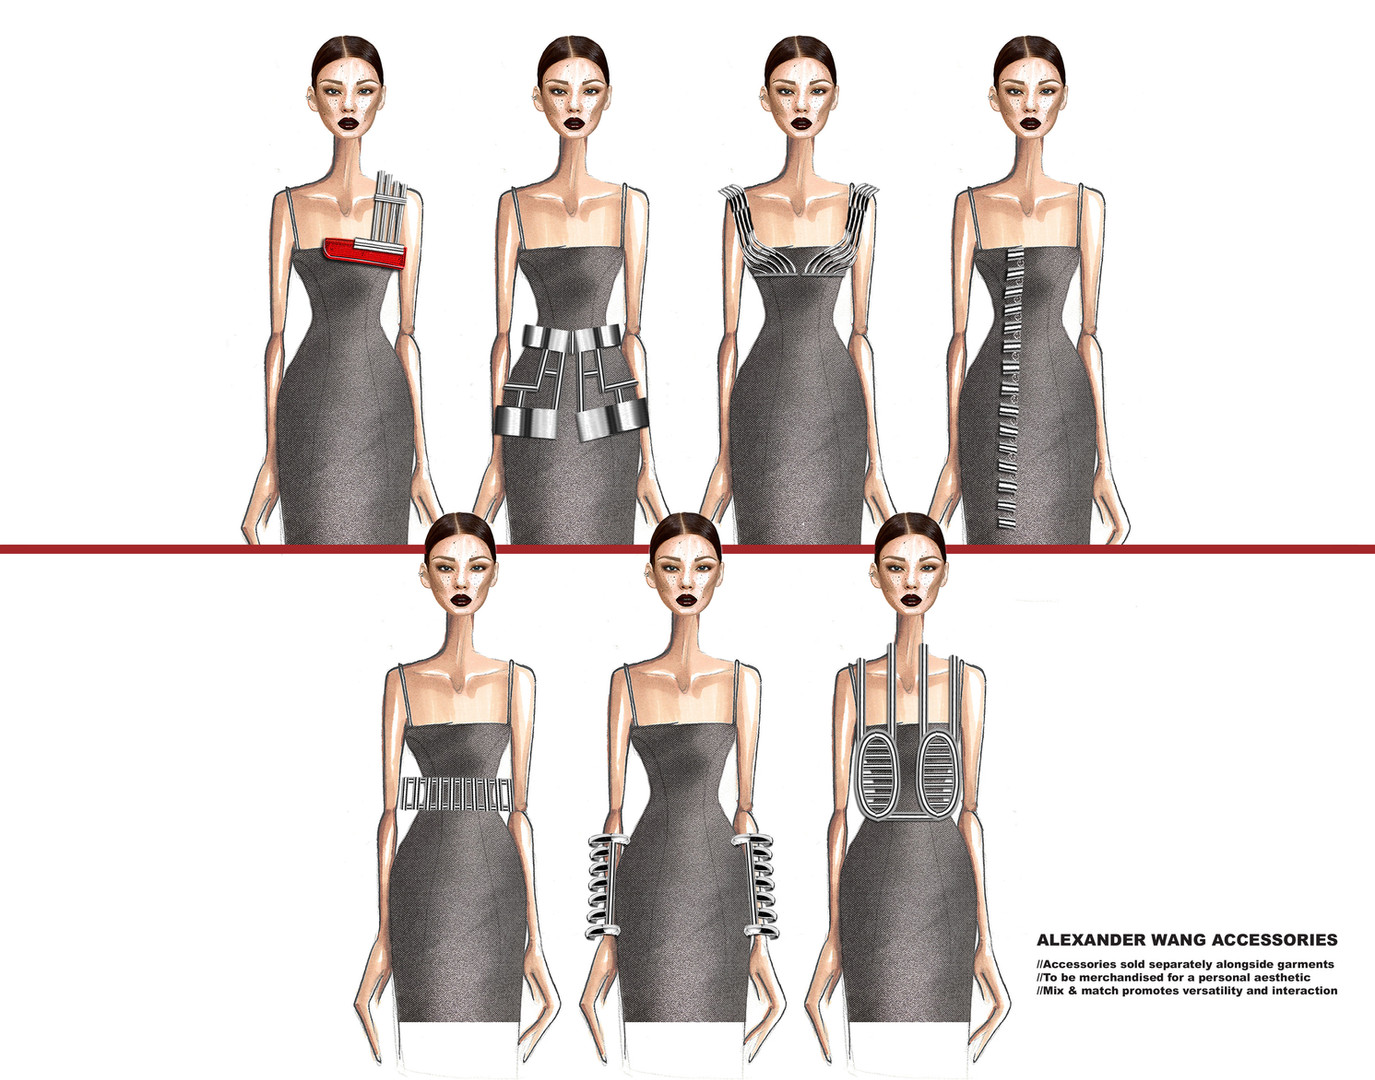 AW_accessories.jpg